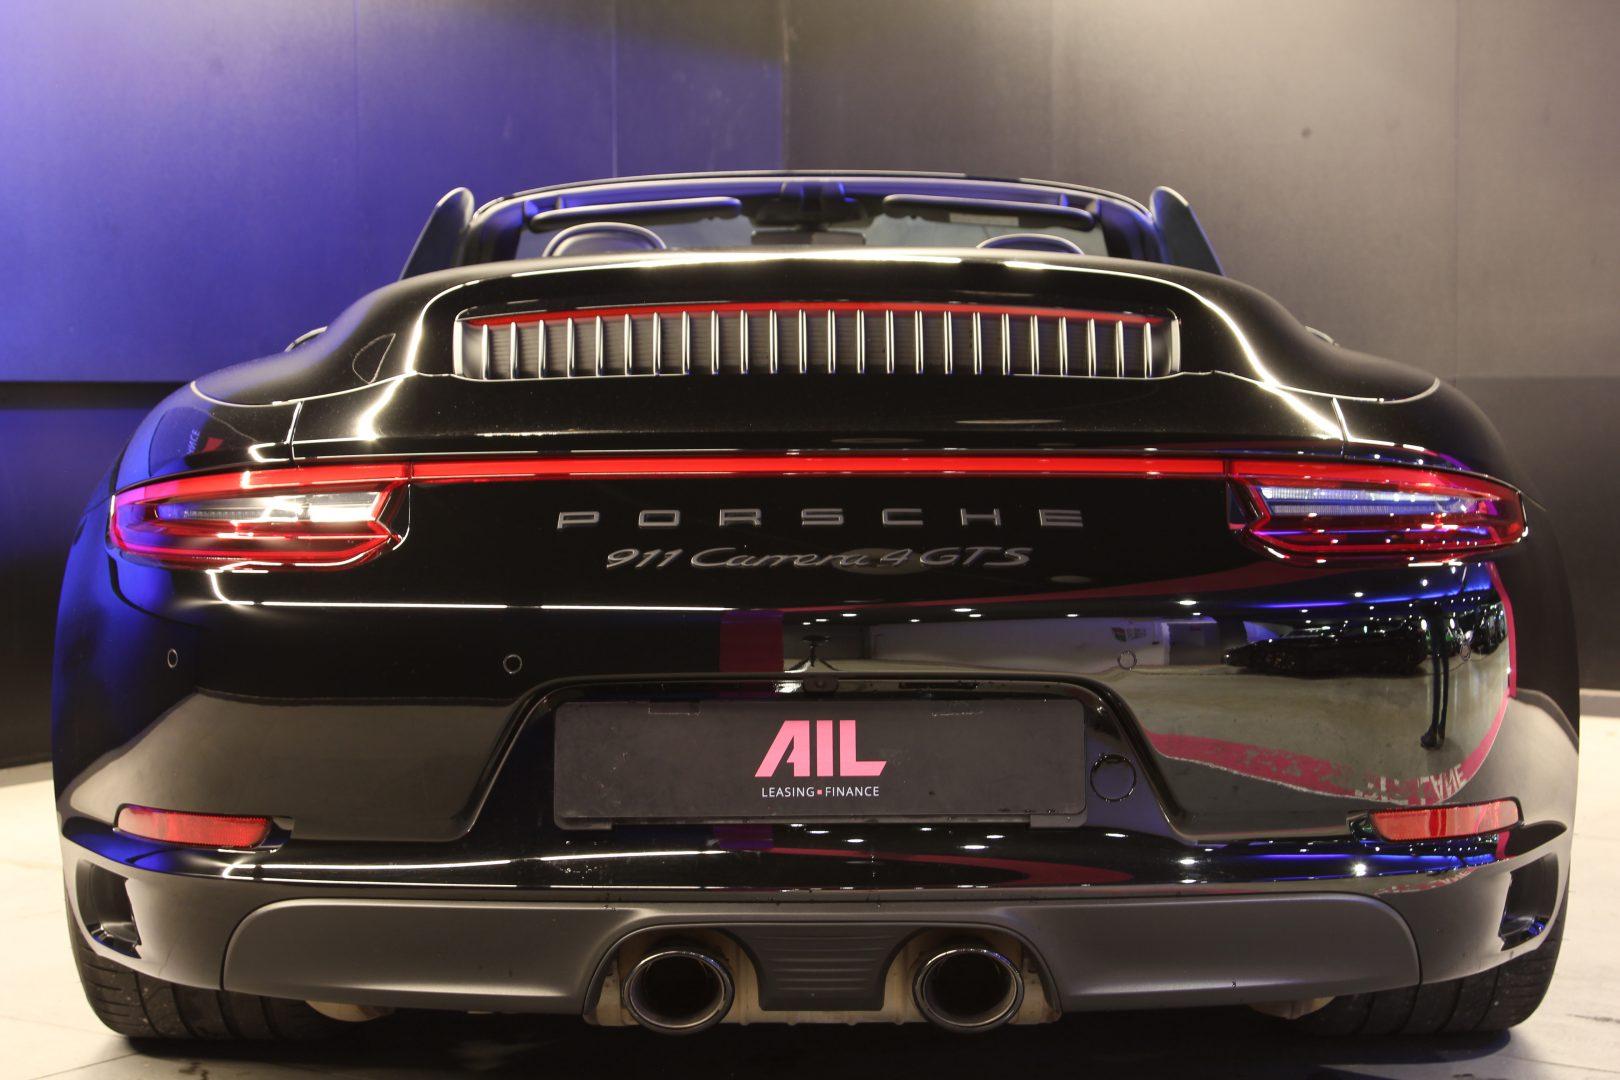 AIL Porsche 991 4 GTS Cabriolet LED Burmester High-End 12